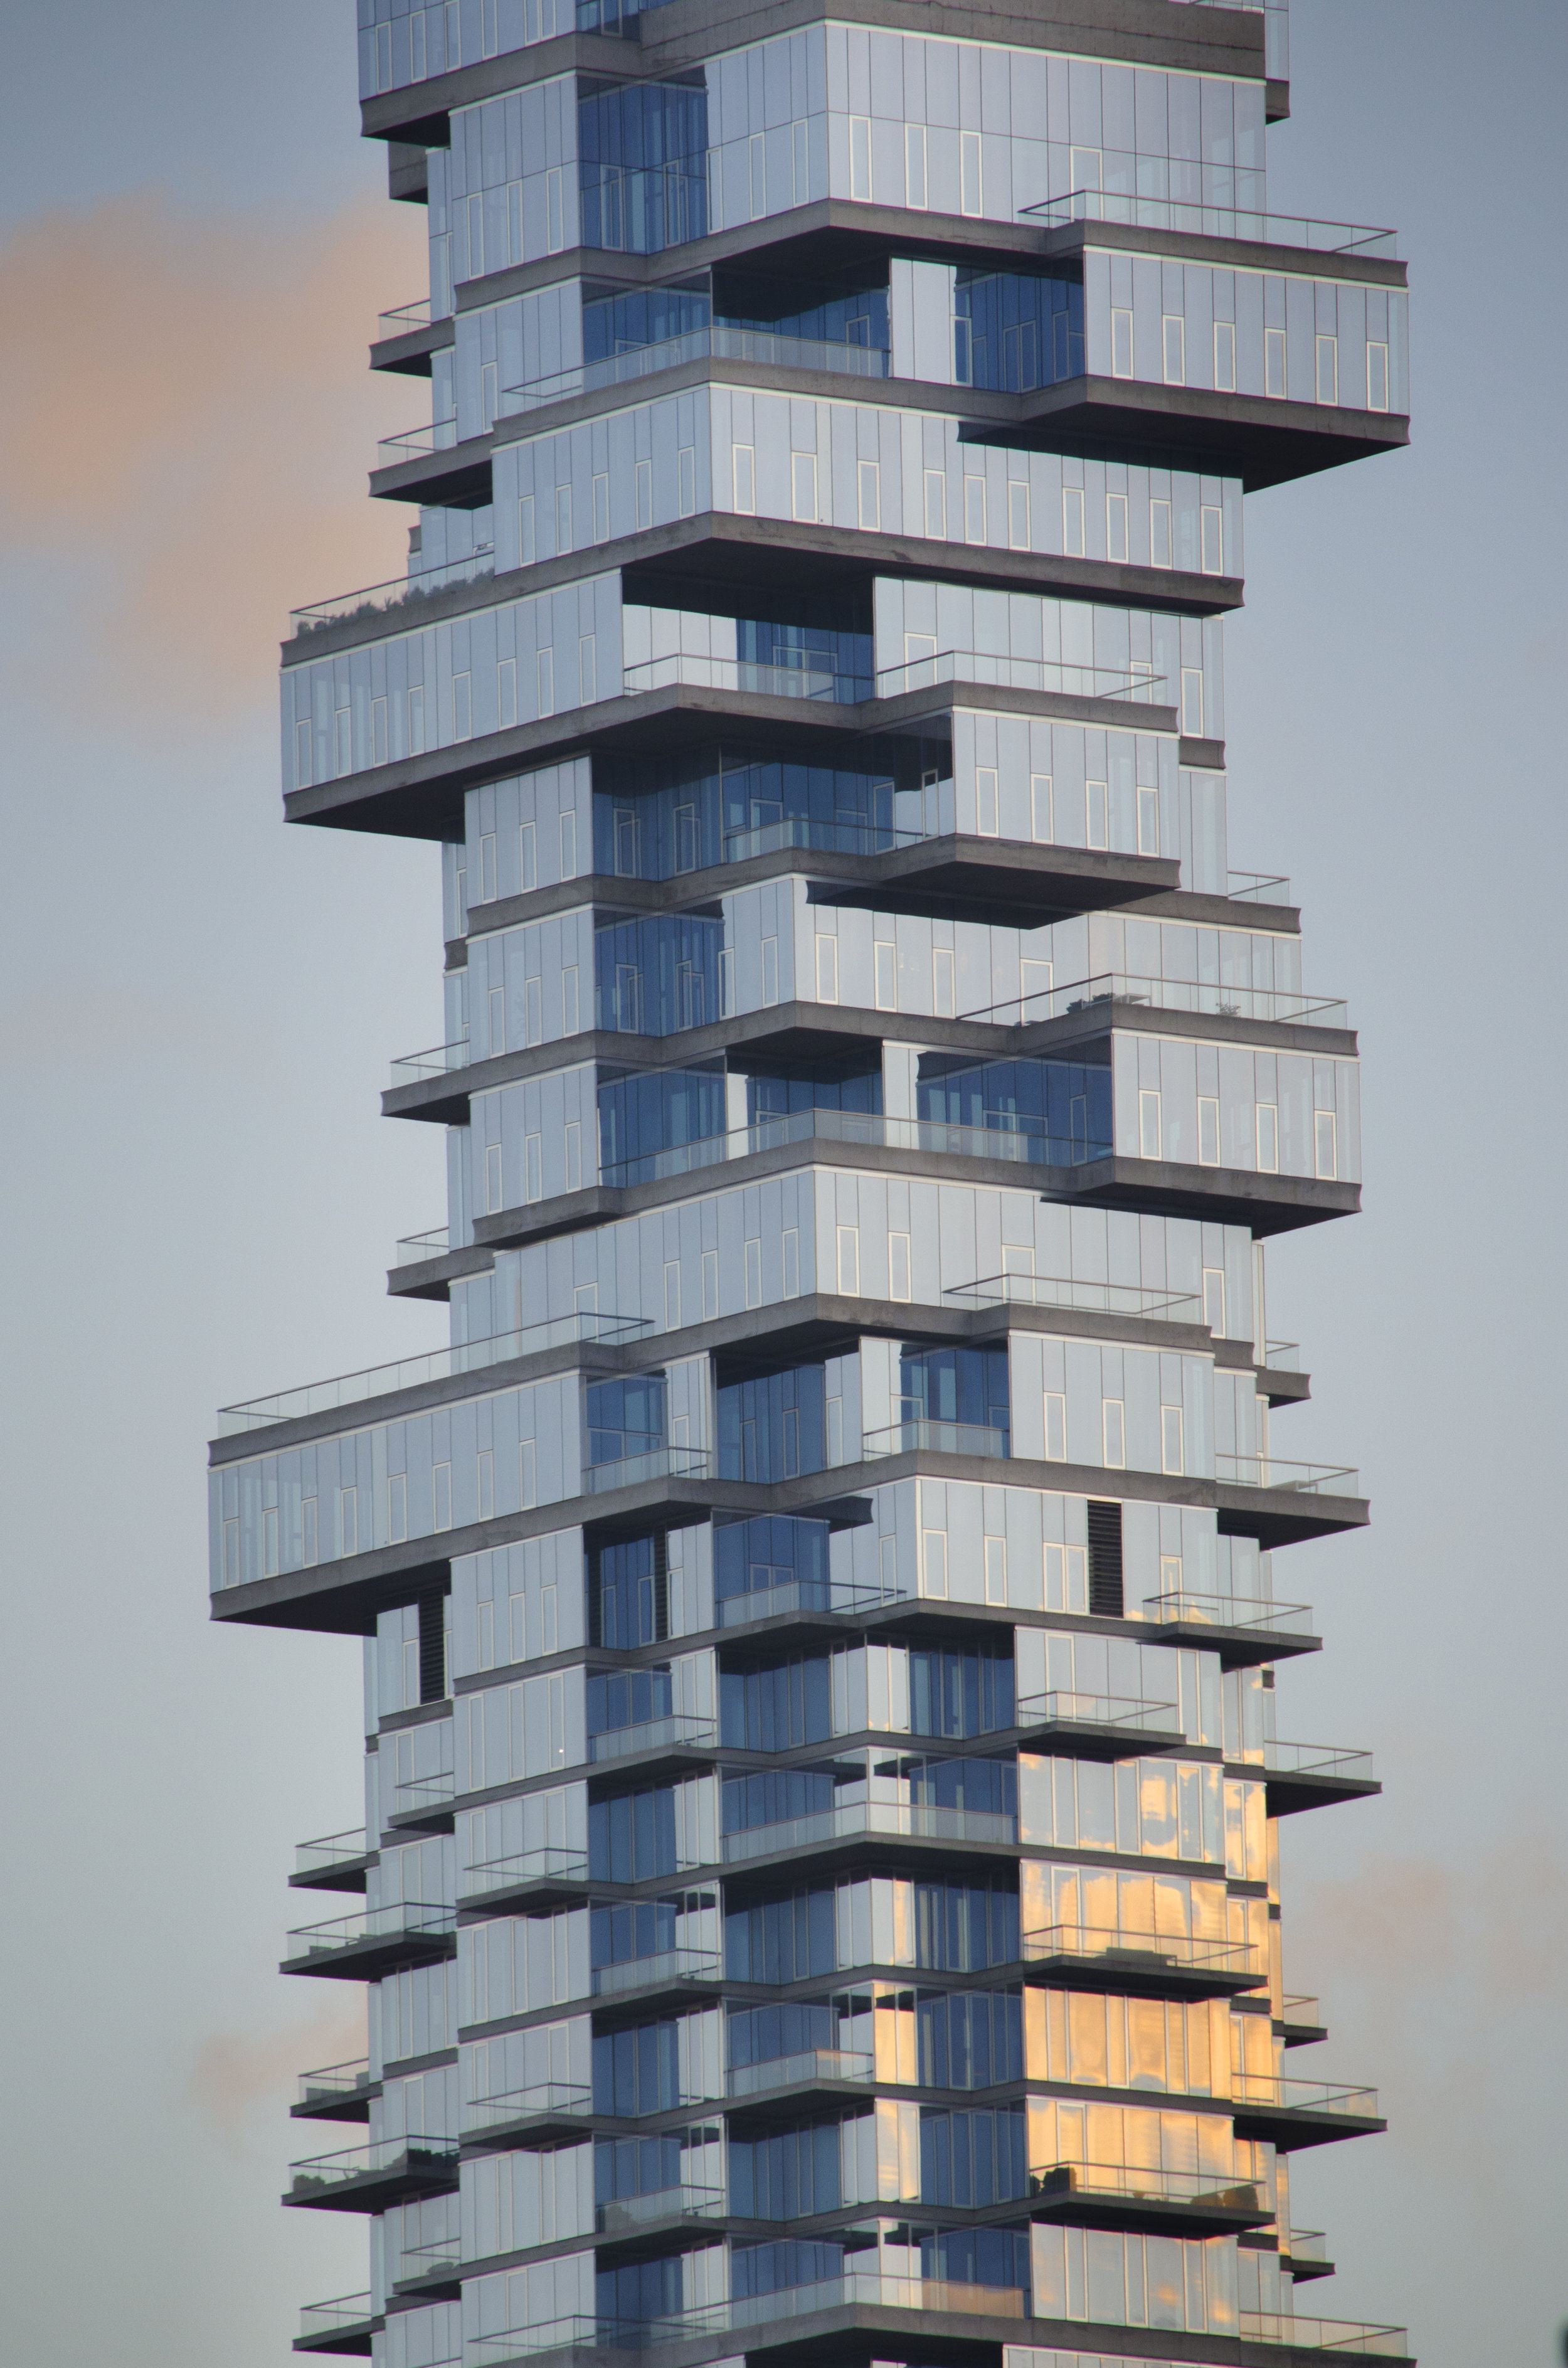 jenga-architecture_38680504232_o.jpg